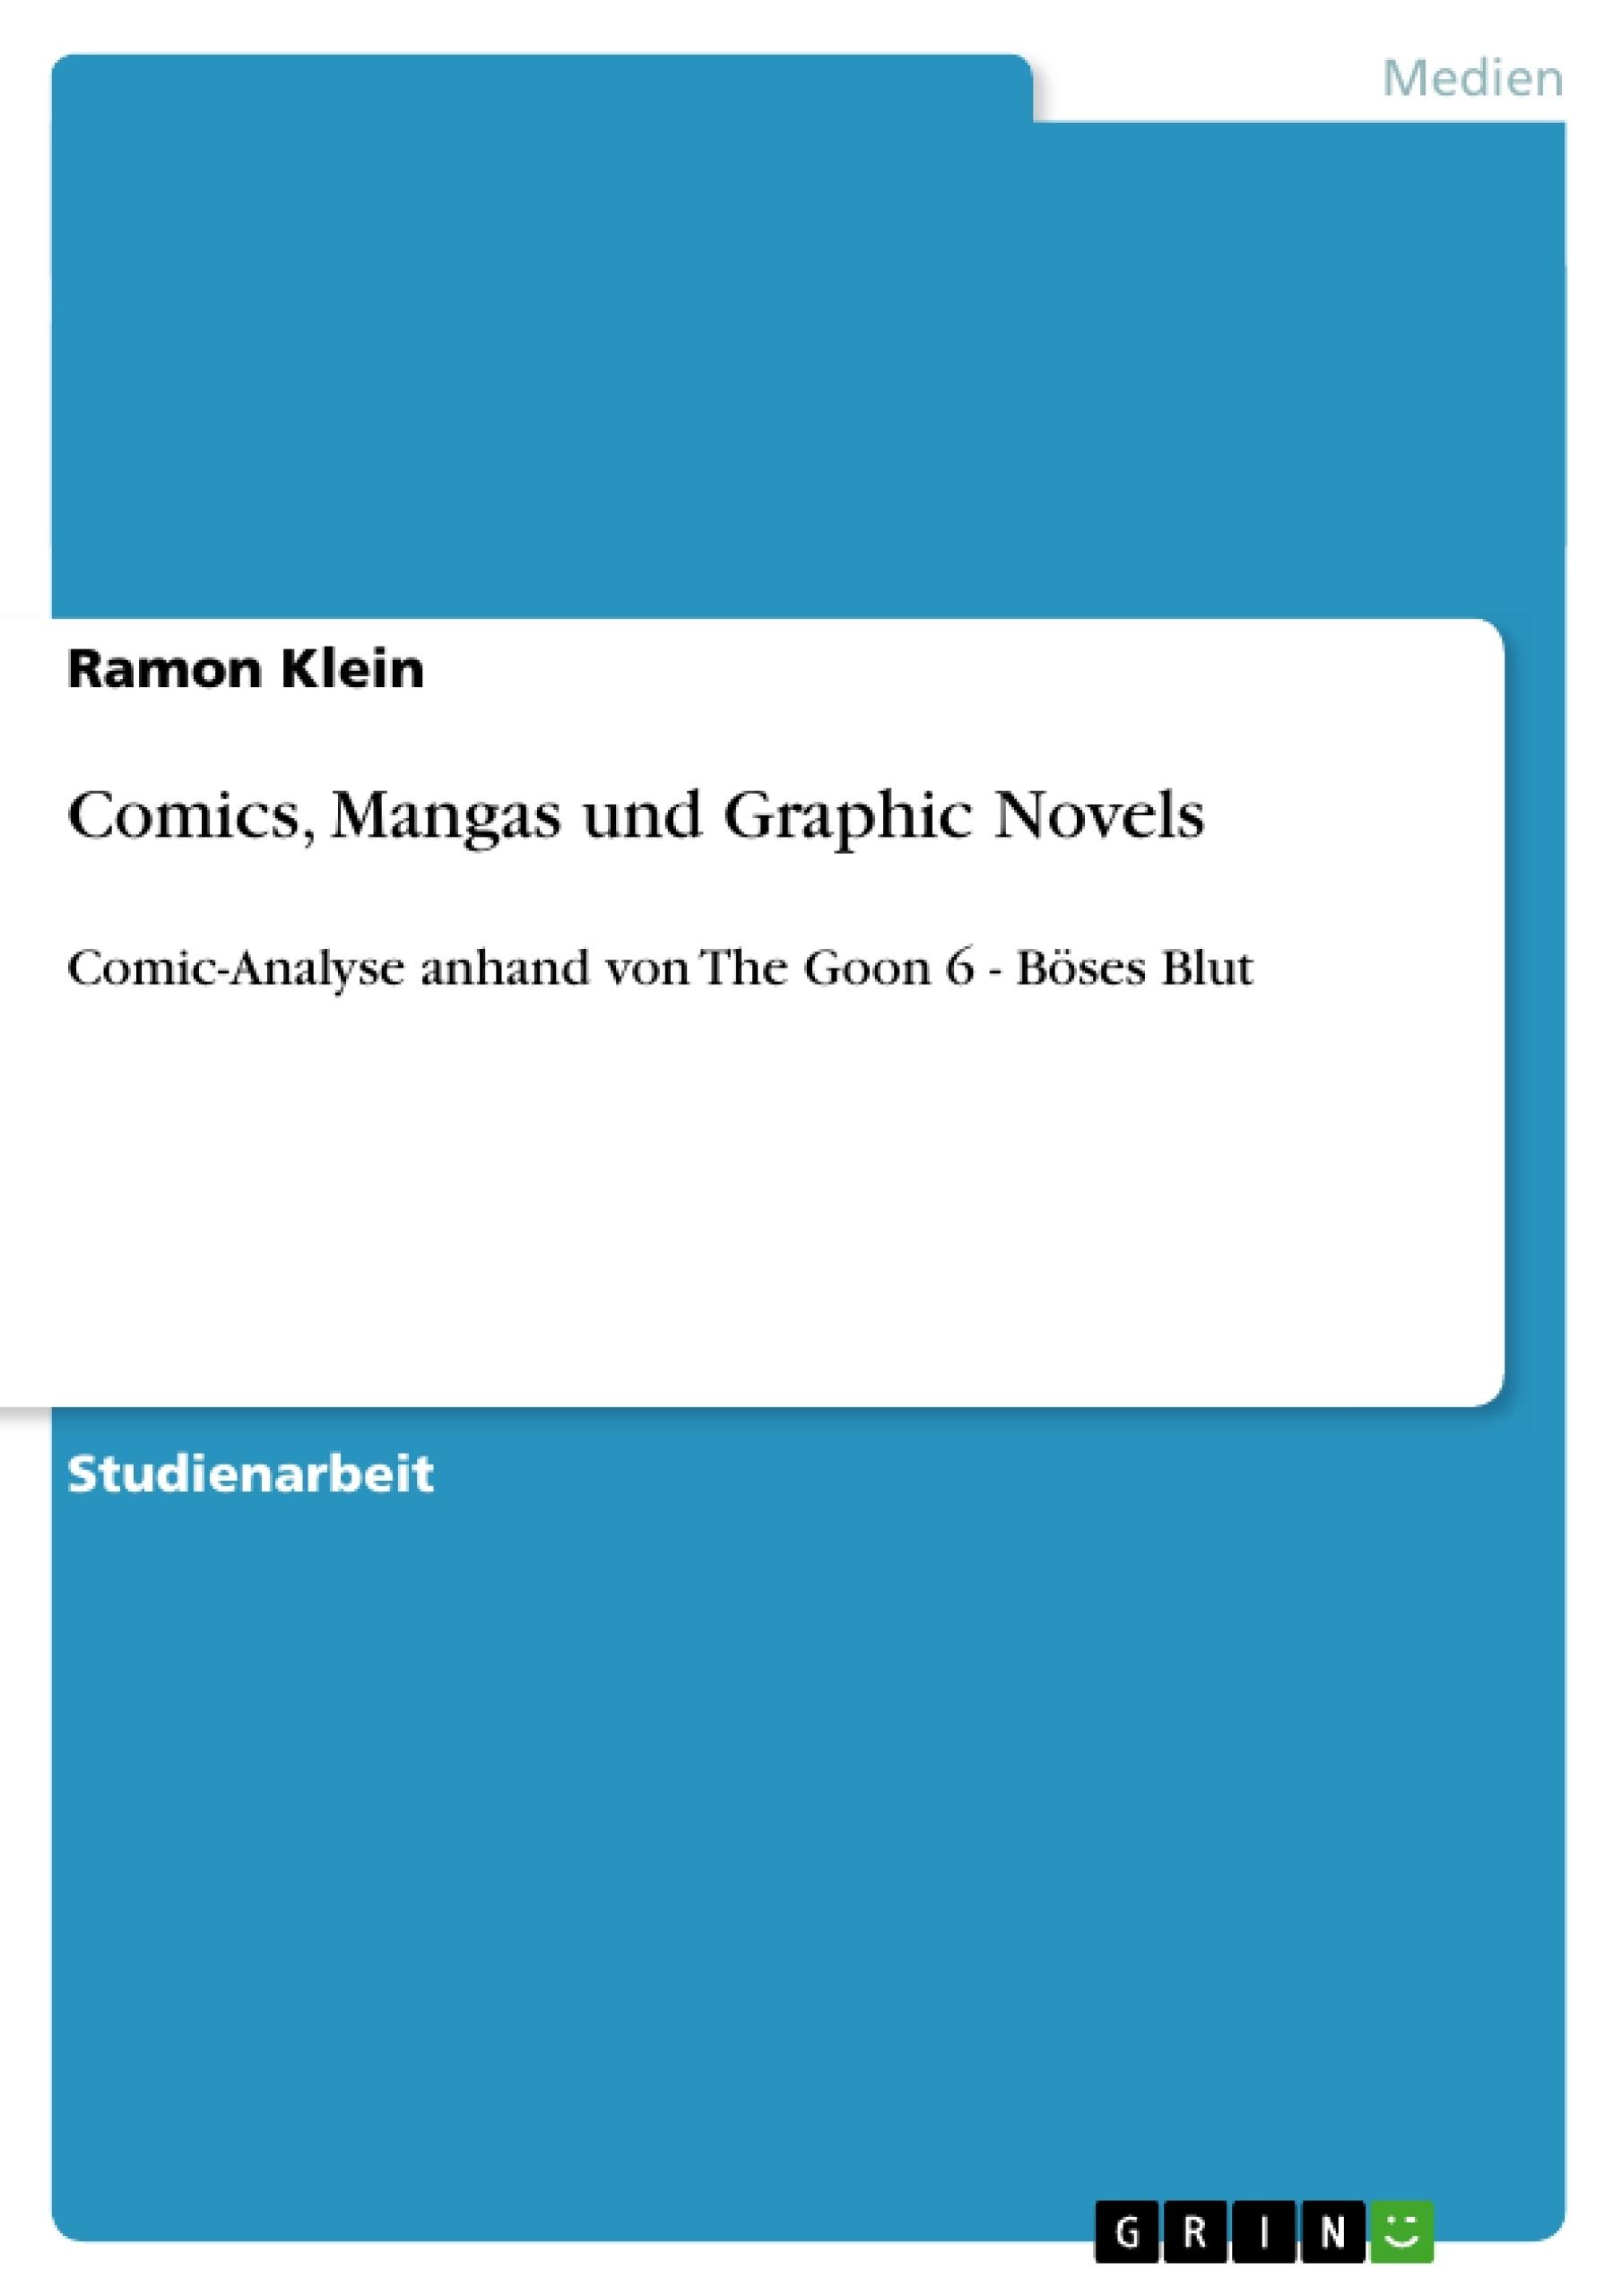 Titel: Comics, Mangas und Graphic Novels